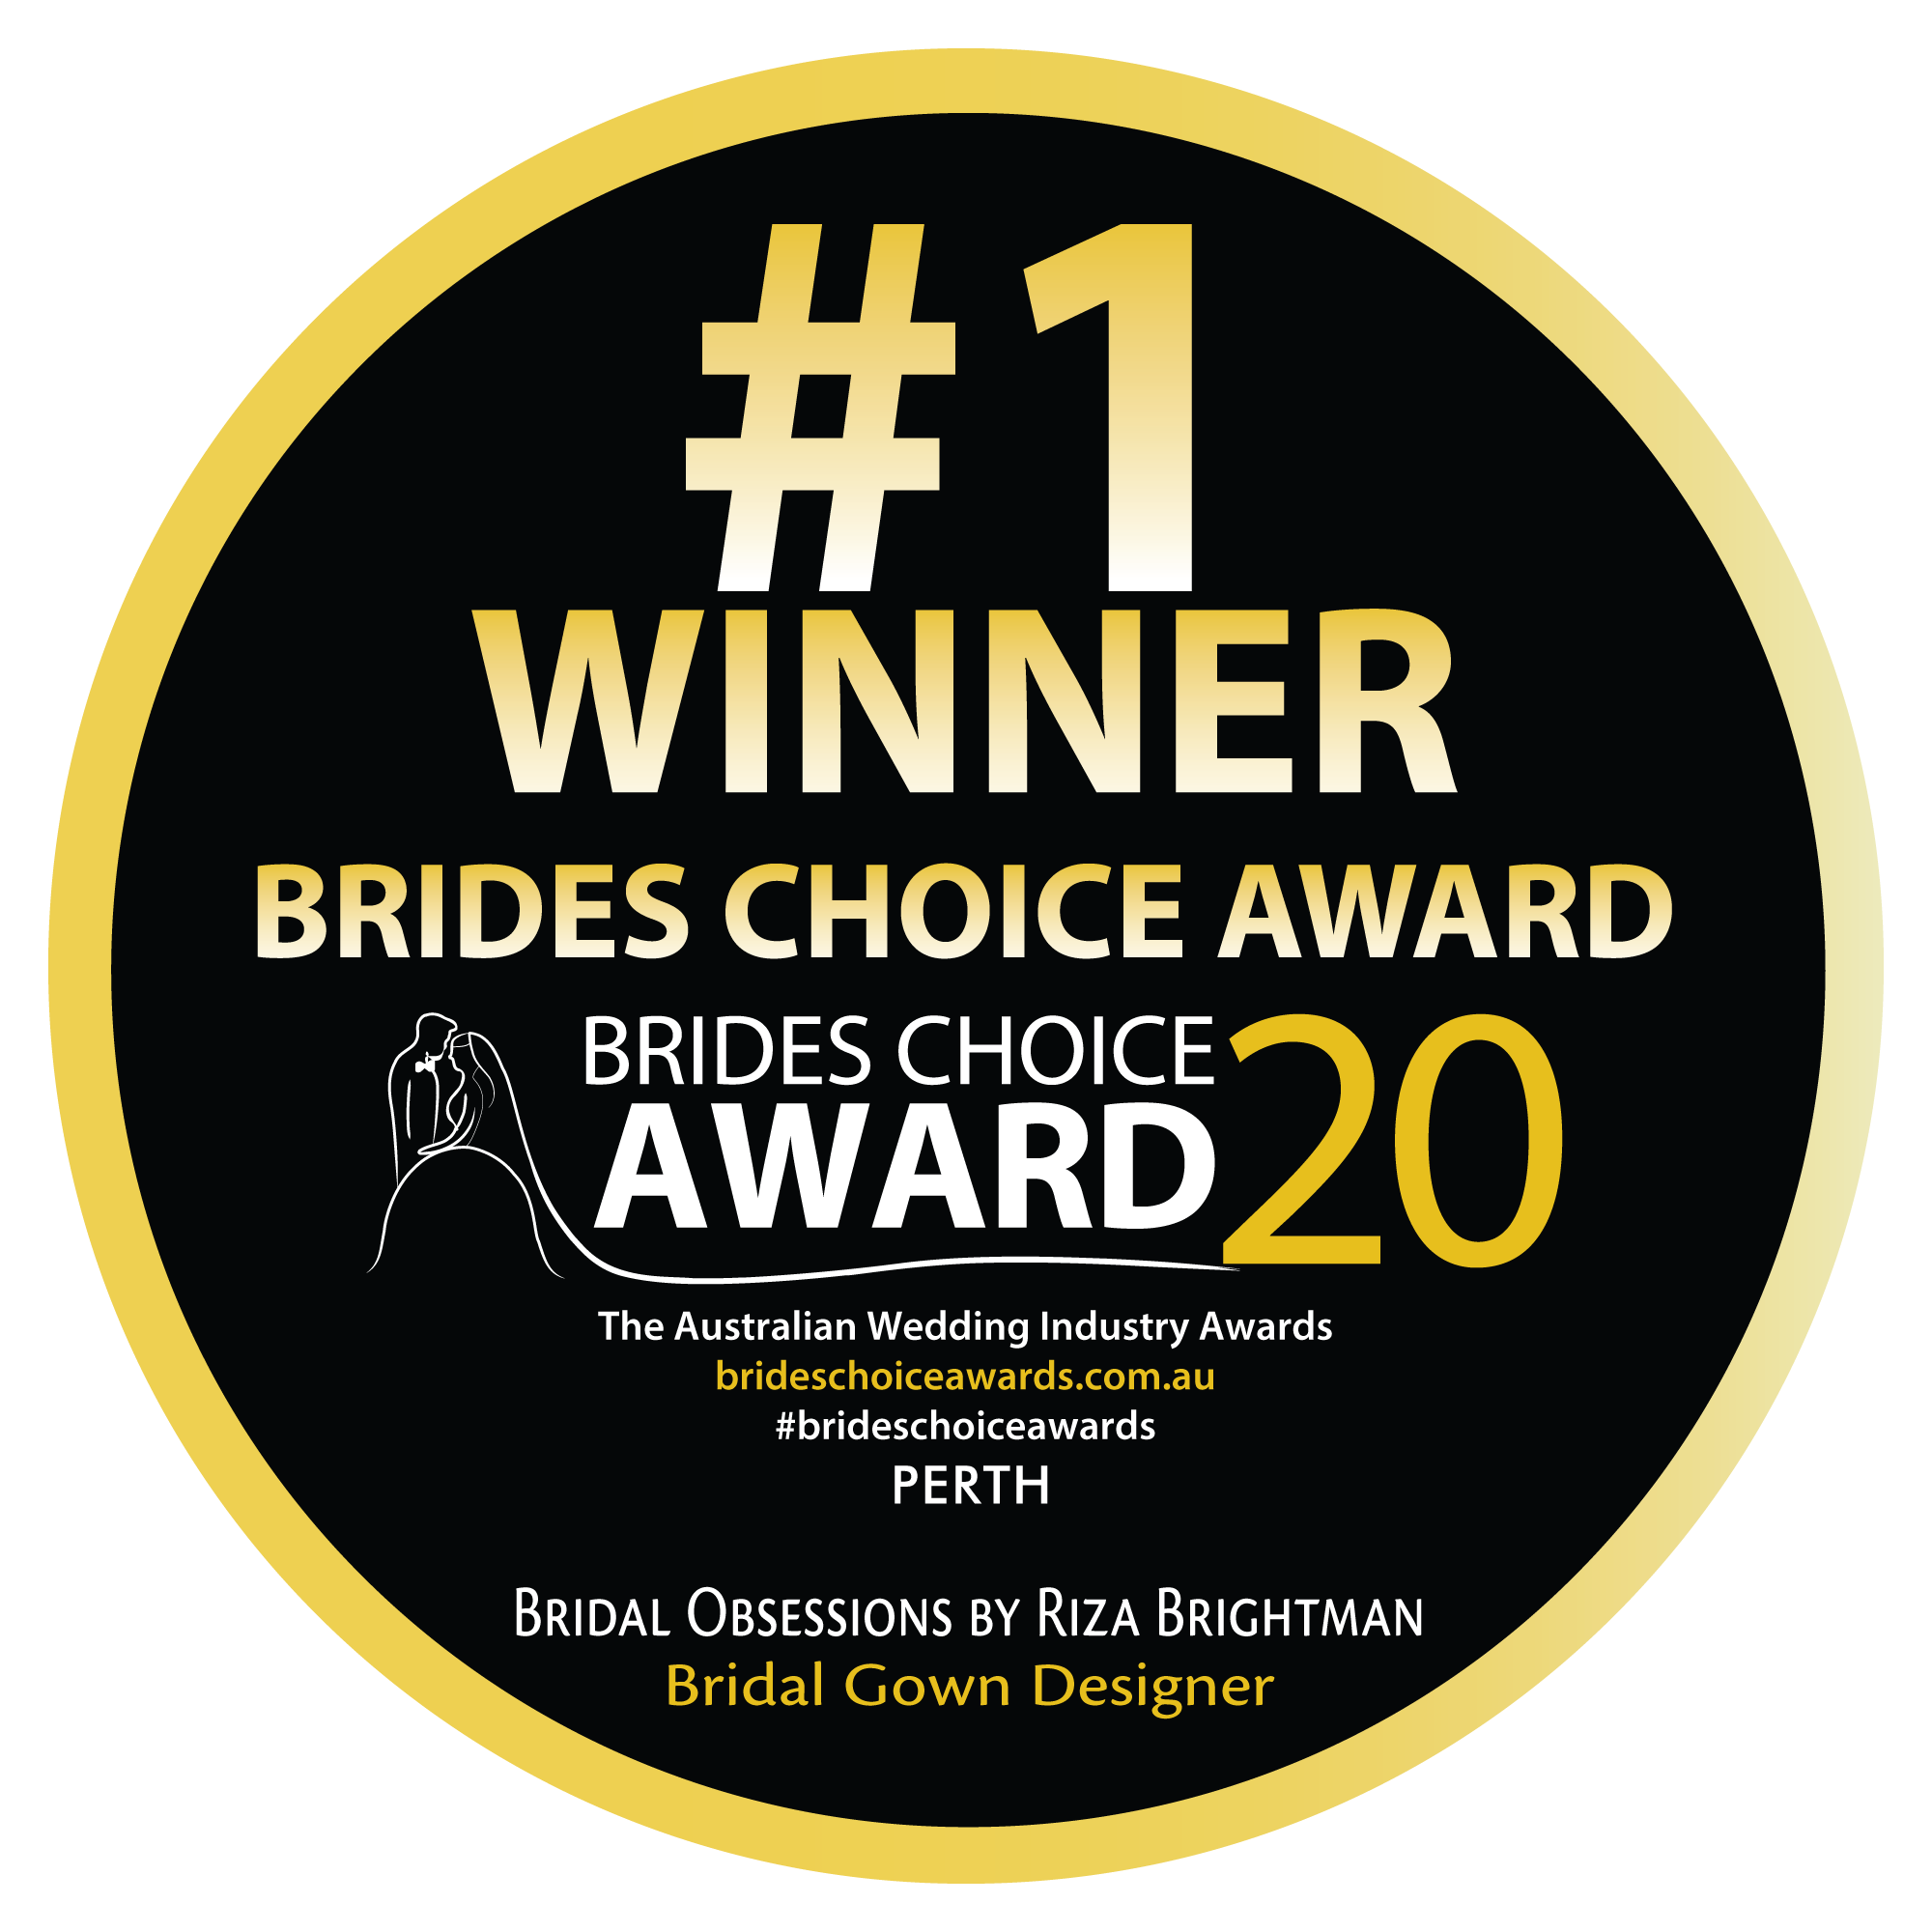 Bridal gown designer